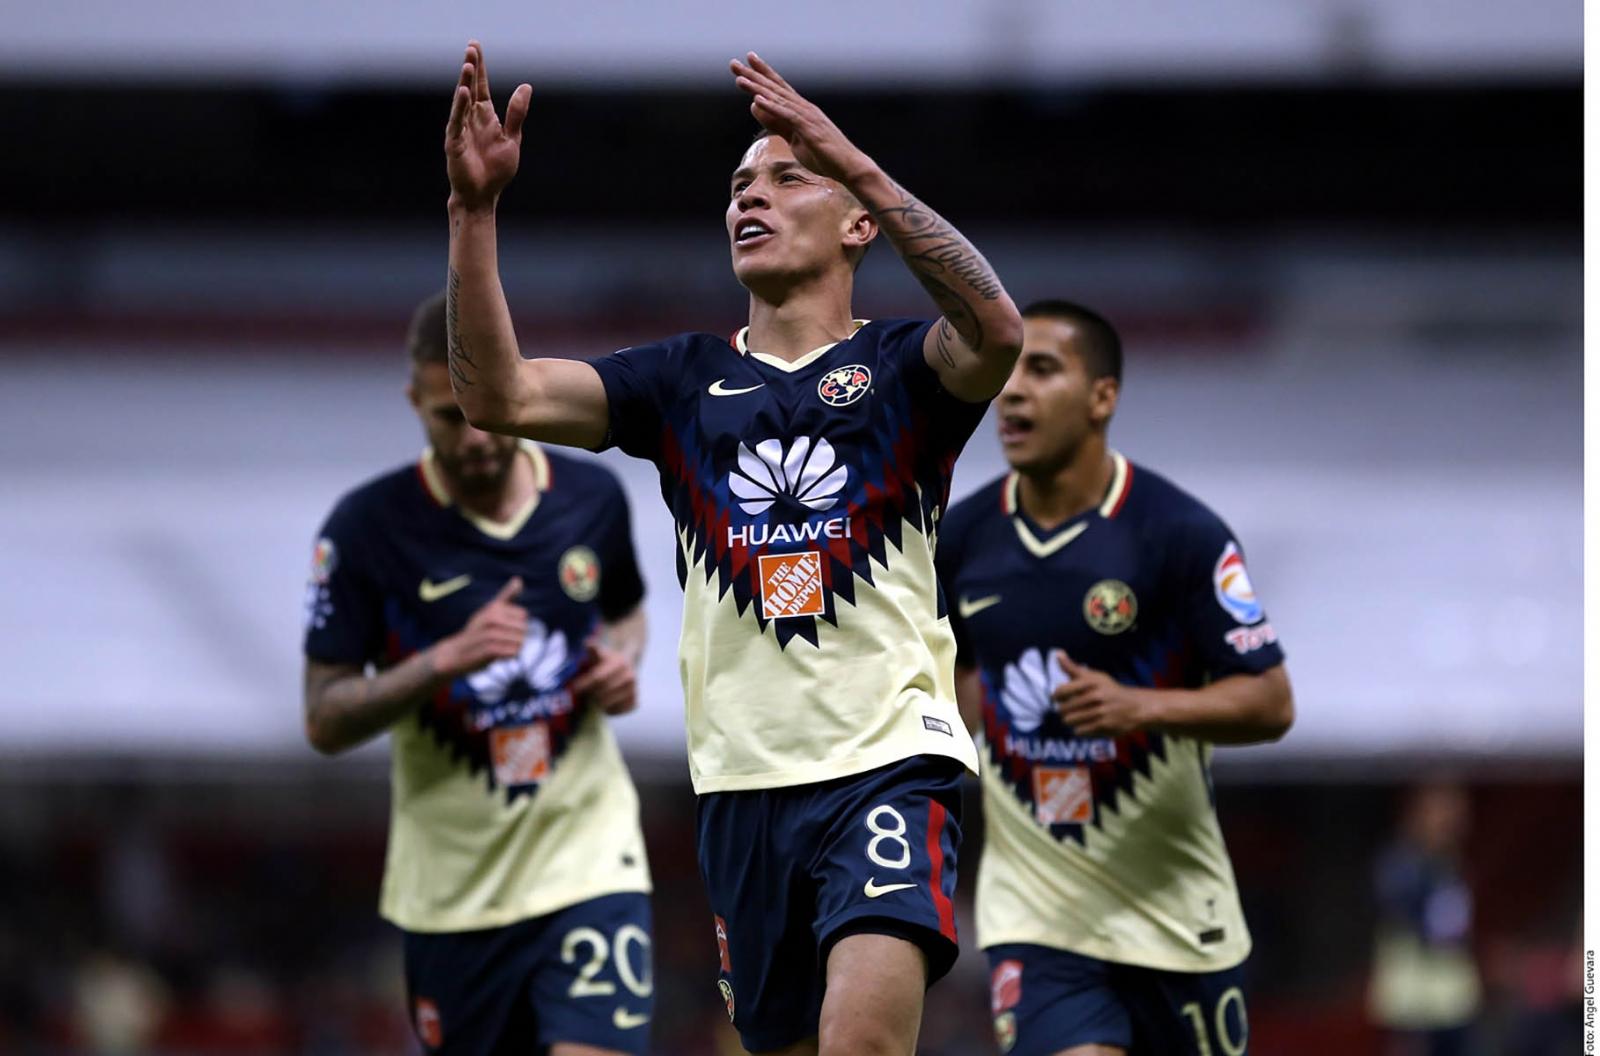 América se impone 4-1 a Monarcas Morelia con doblete de Uribe